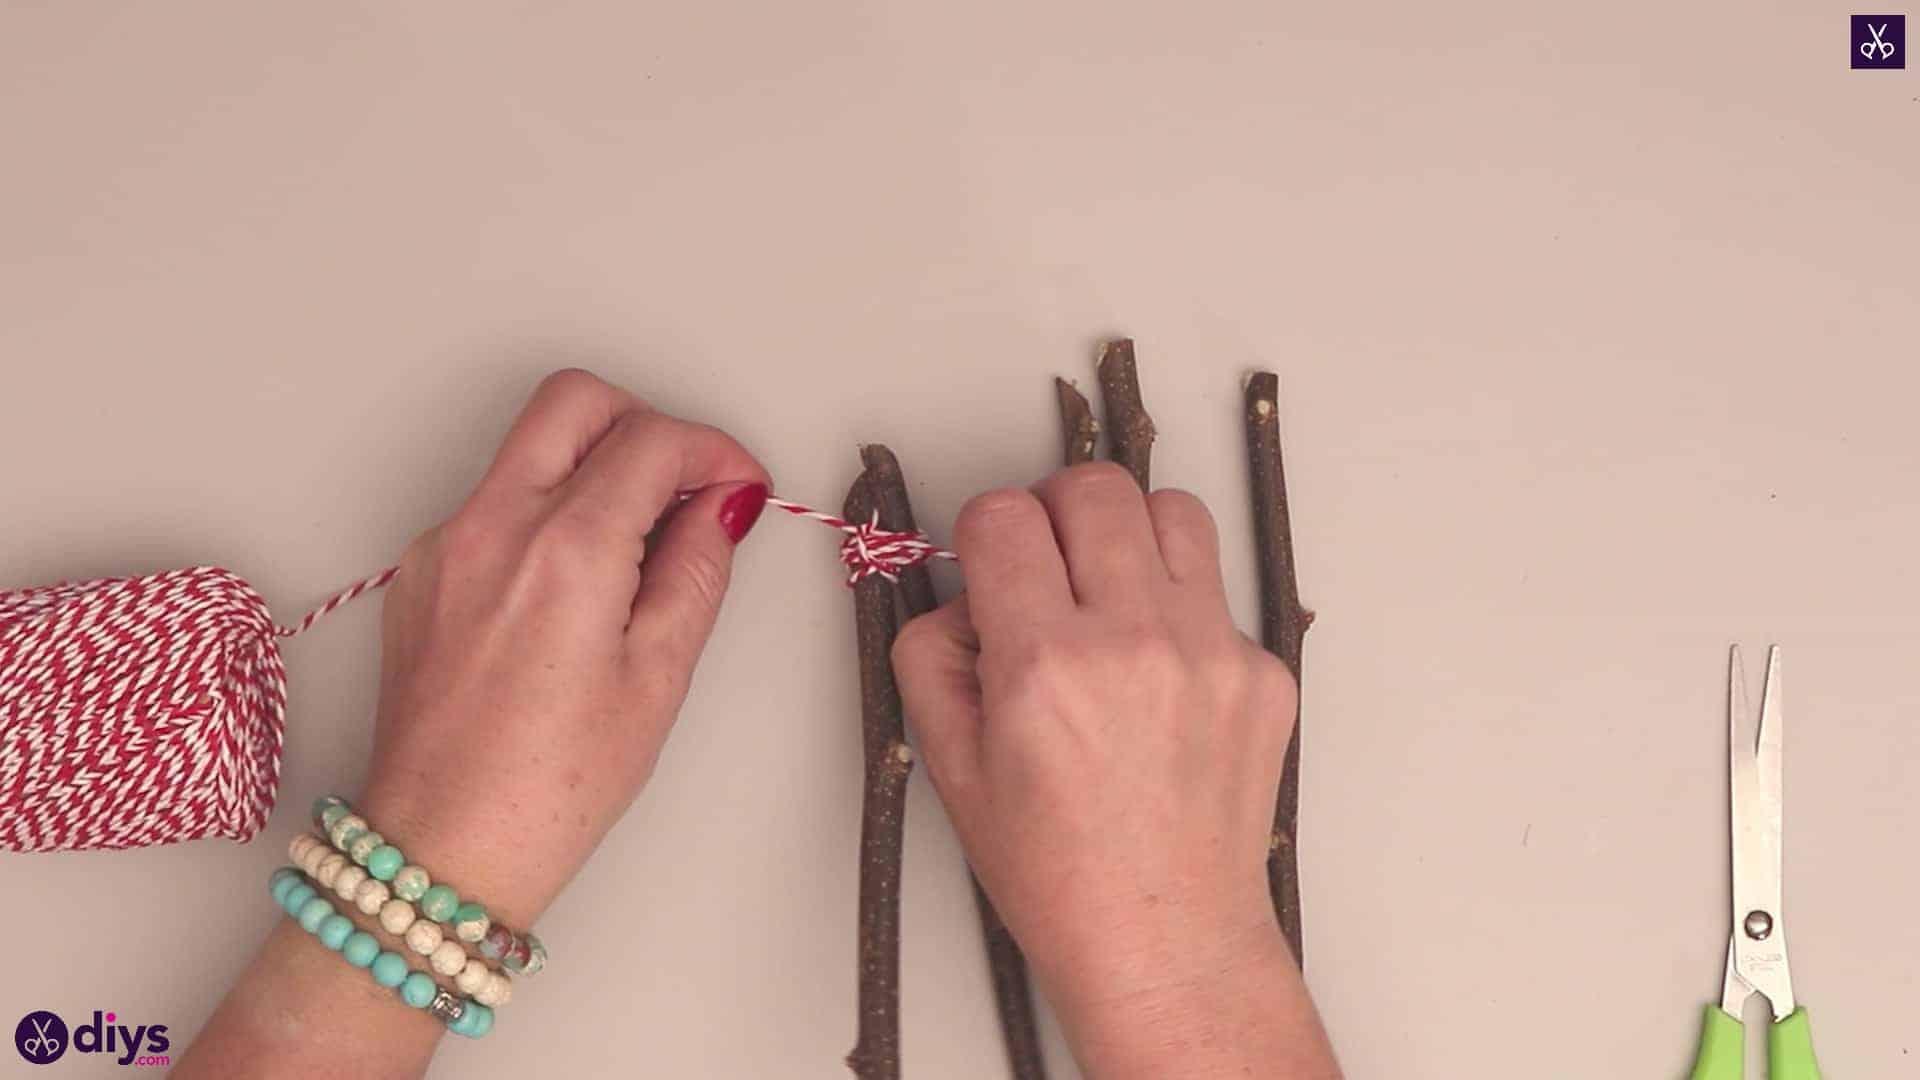 Diy twig star craft stong knot